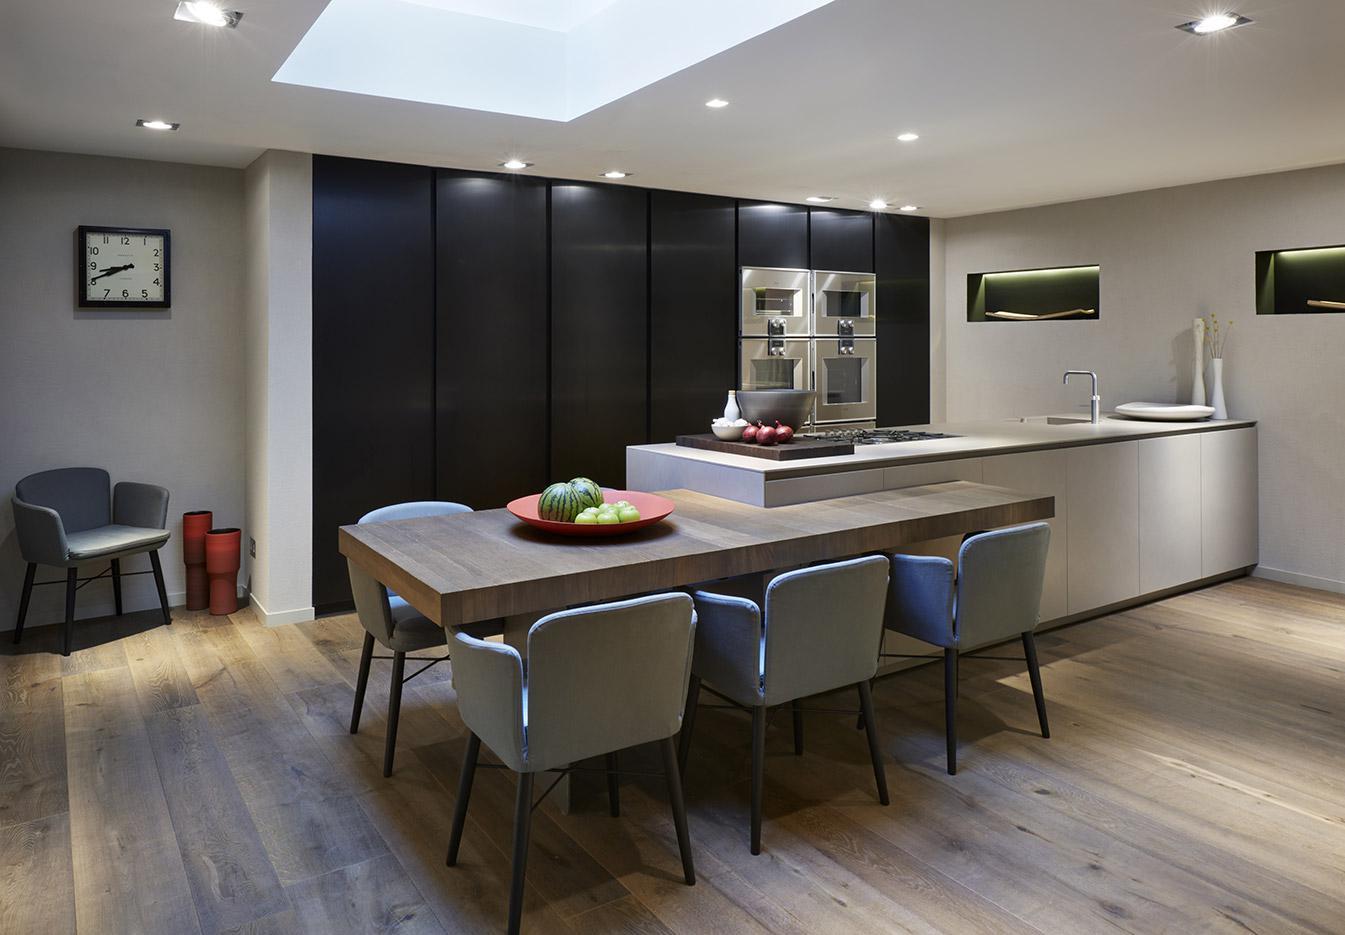 4 cocinas para ser tu propio chef en casa forbes m xico for Suspension de cocina moderna